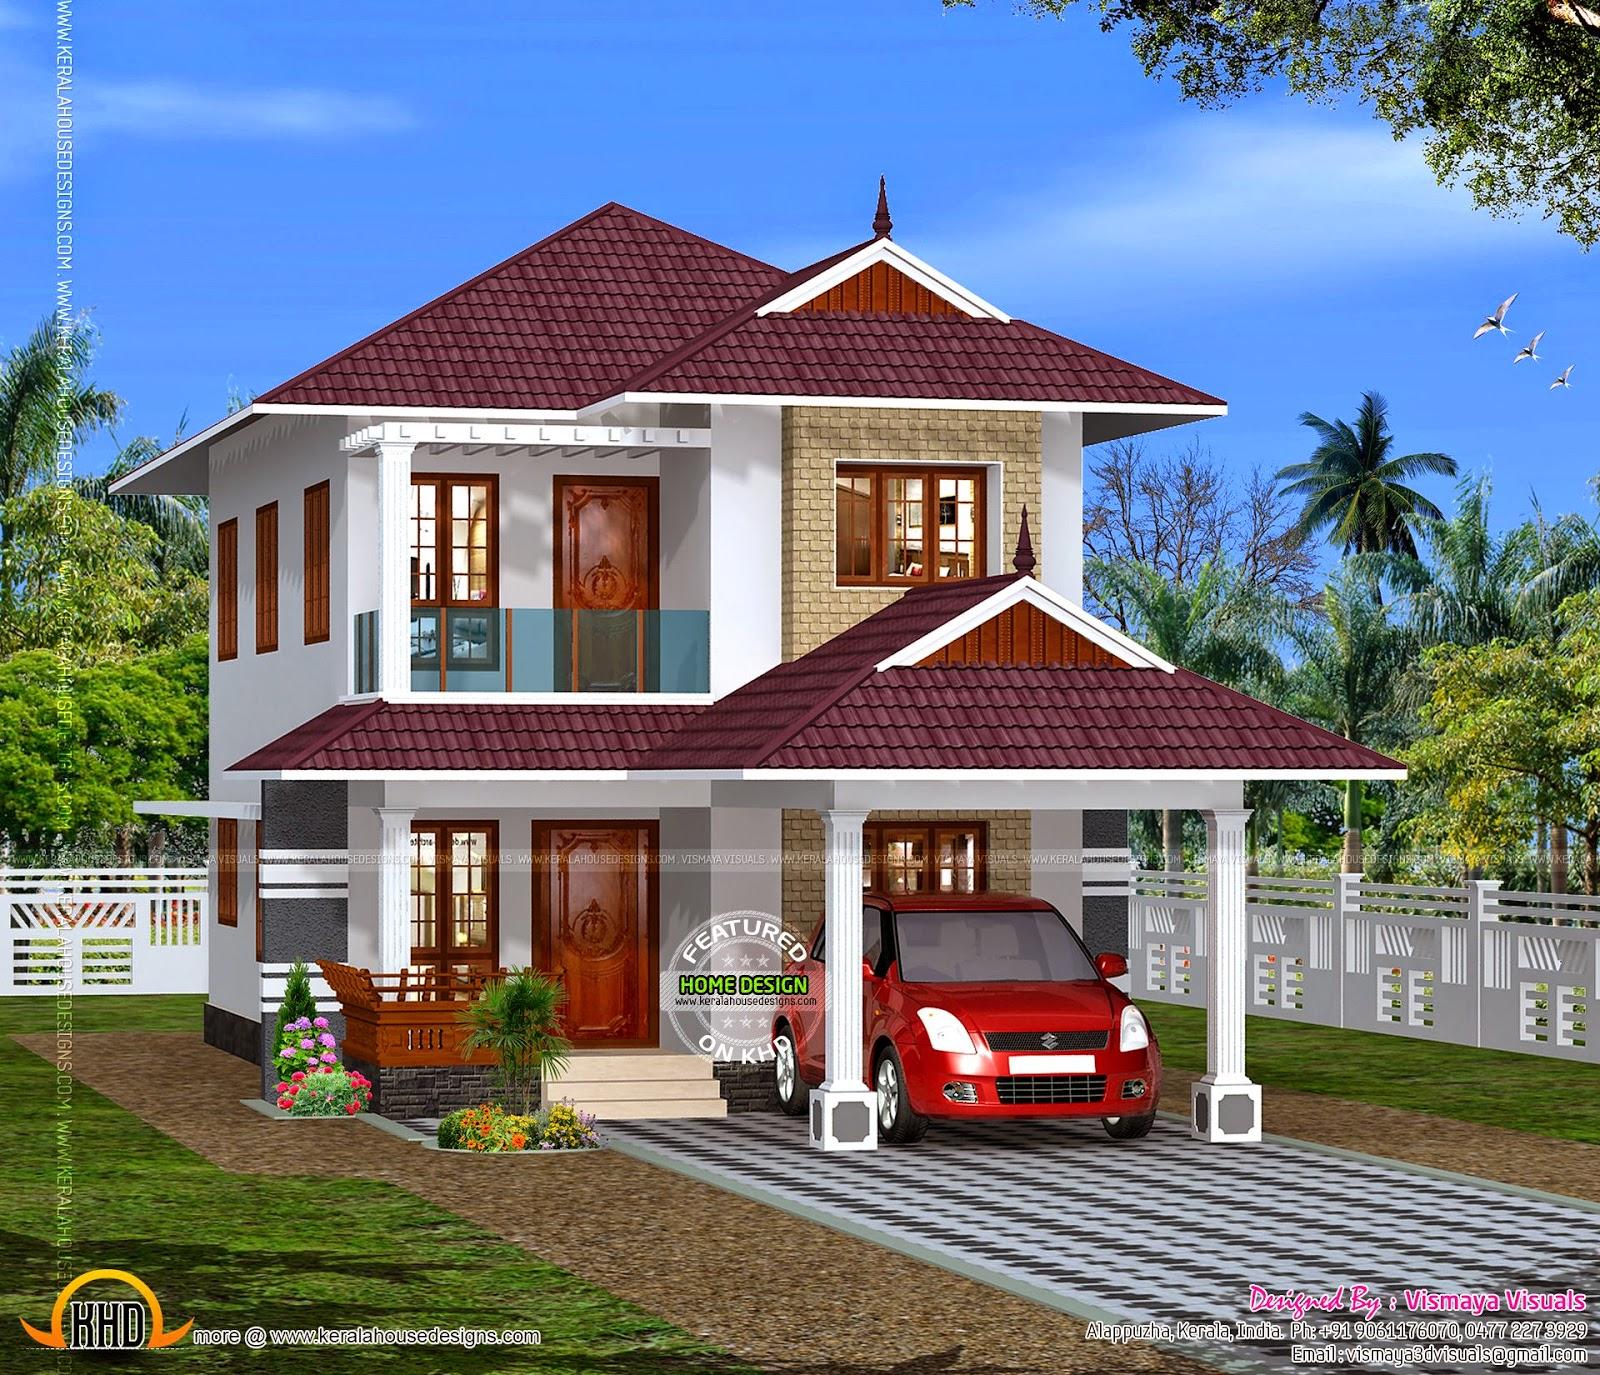 Clean box type house exterior keralahousedesigns